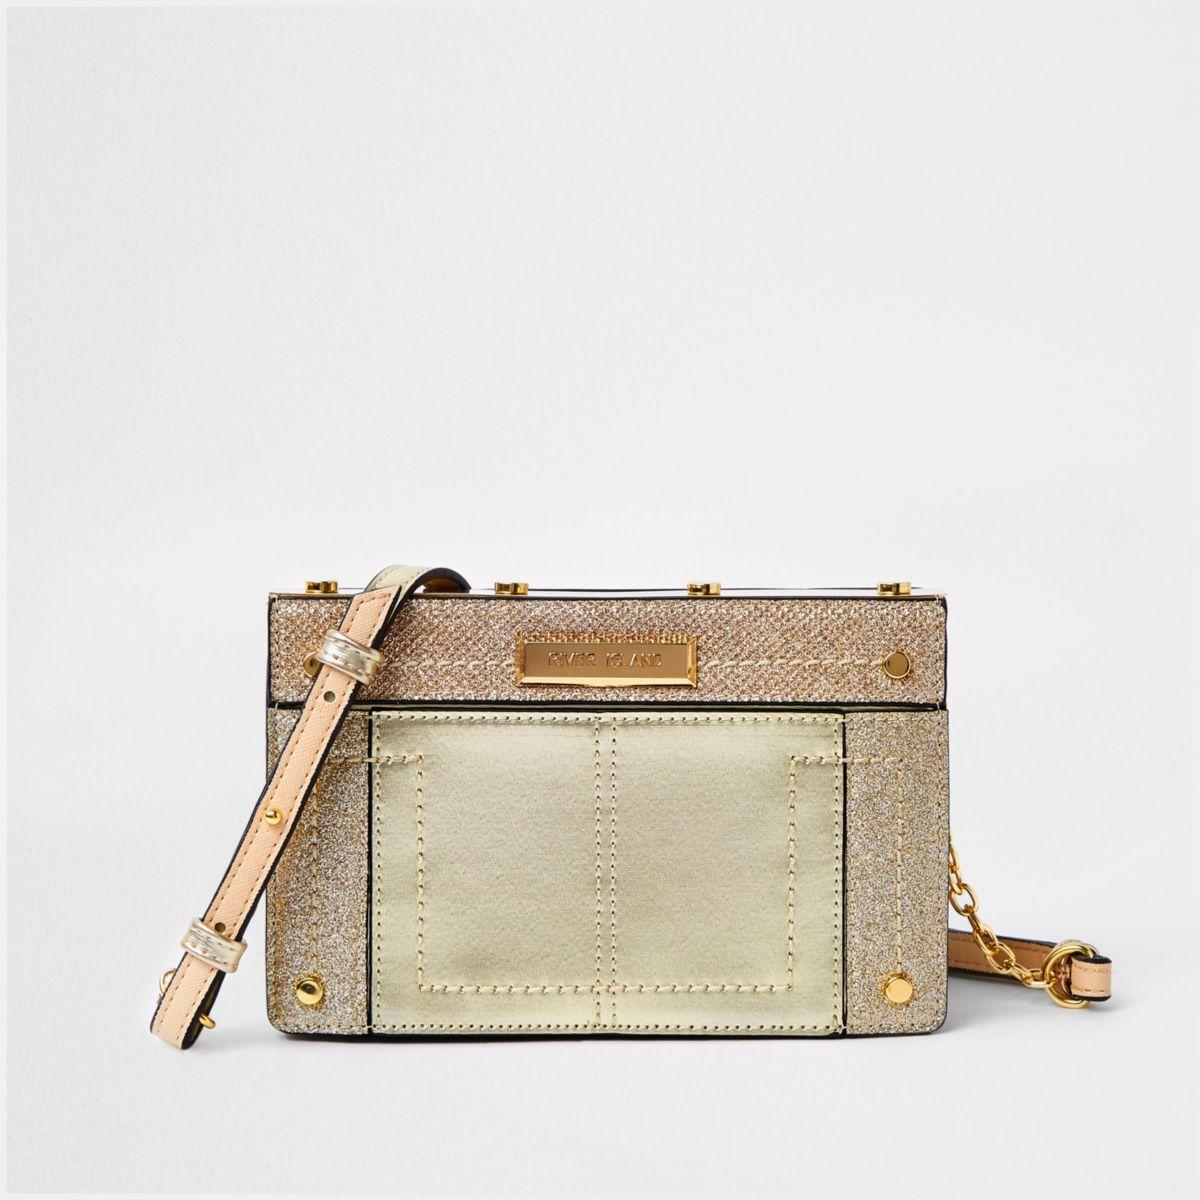 Gold metal small boxy cross body bag